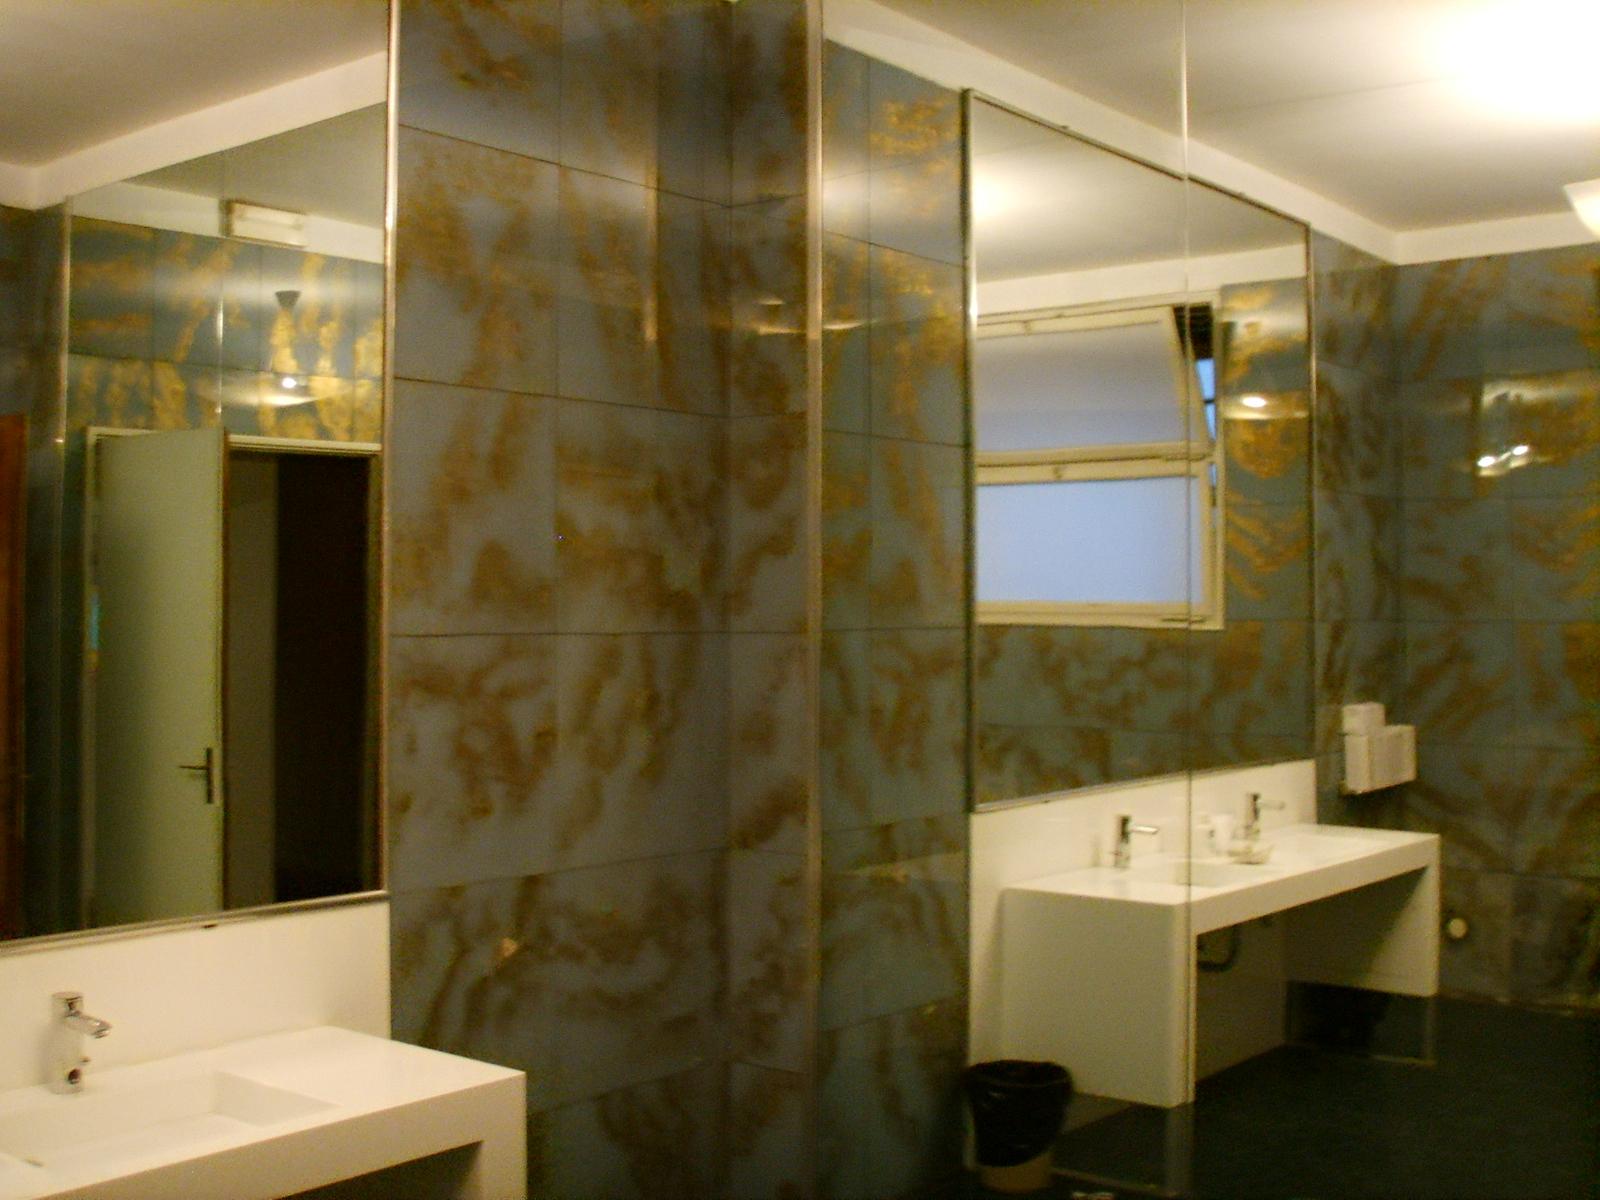 Vasca Da Bagno Wikipedia : File:palazzina reale bagno.jpg wikipedia